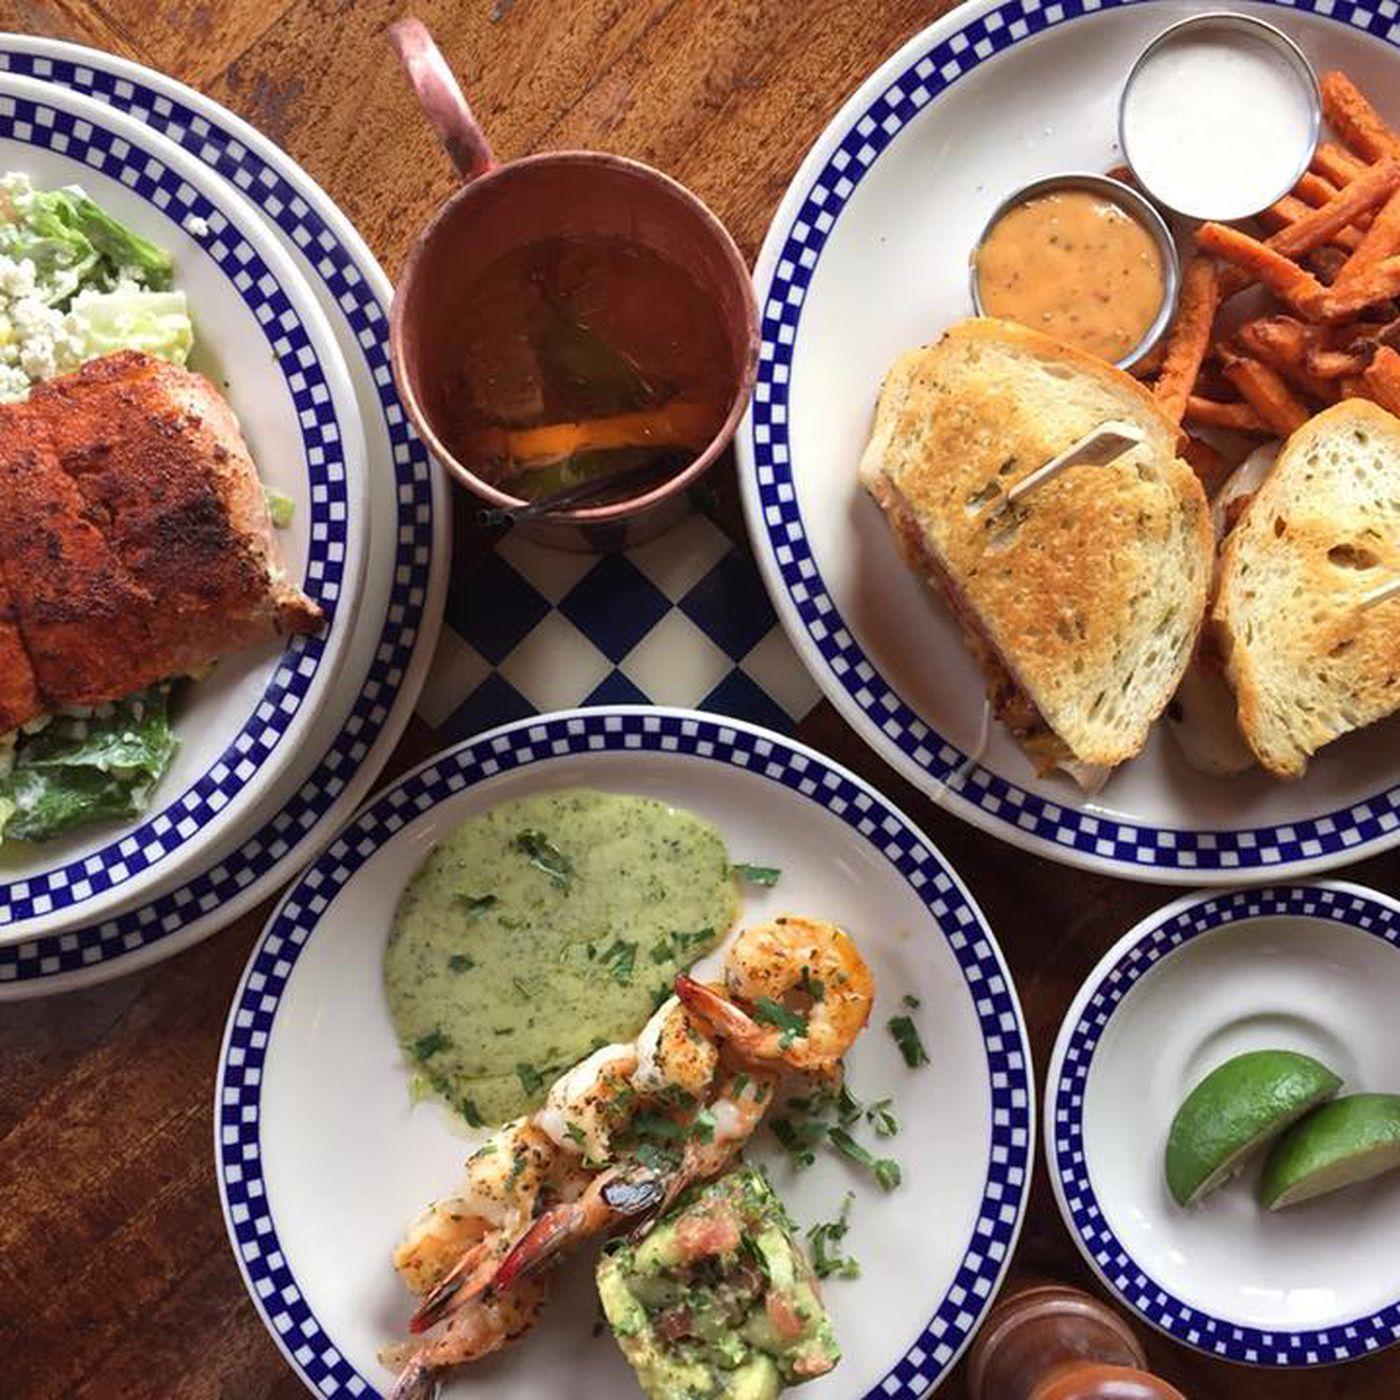 Duke S Chowder House Plans Upscale Bellevue Expansion Eater Seattle